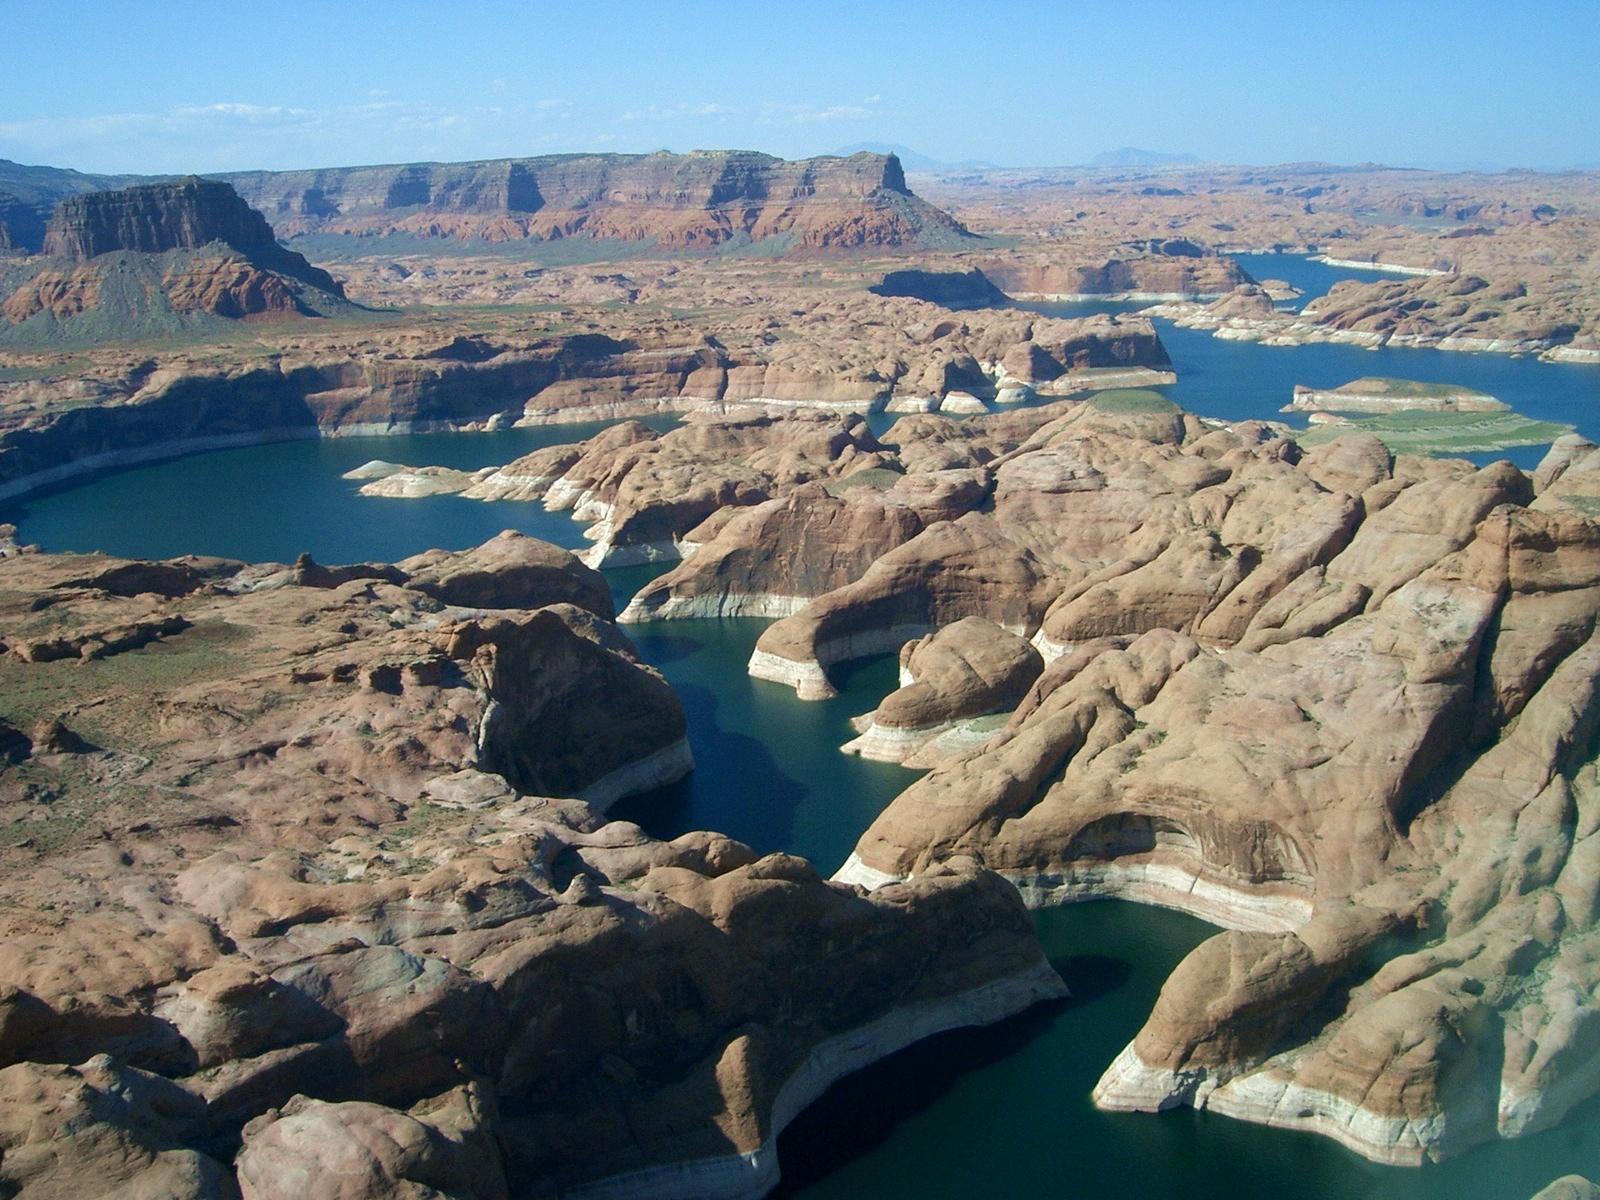 Lake powell utah and arizona united states beautiful for Lake powell fishing